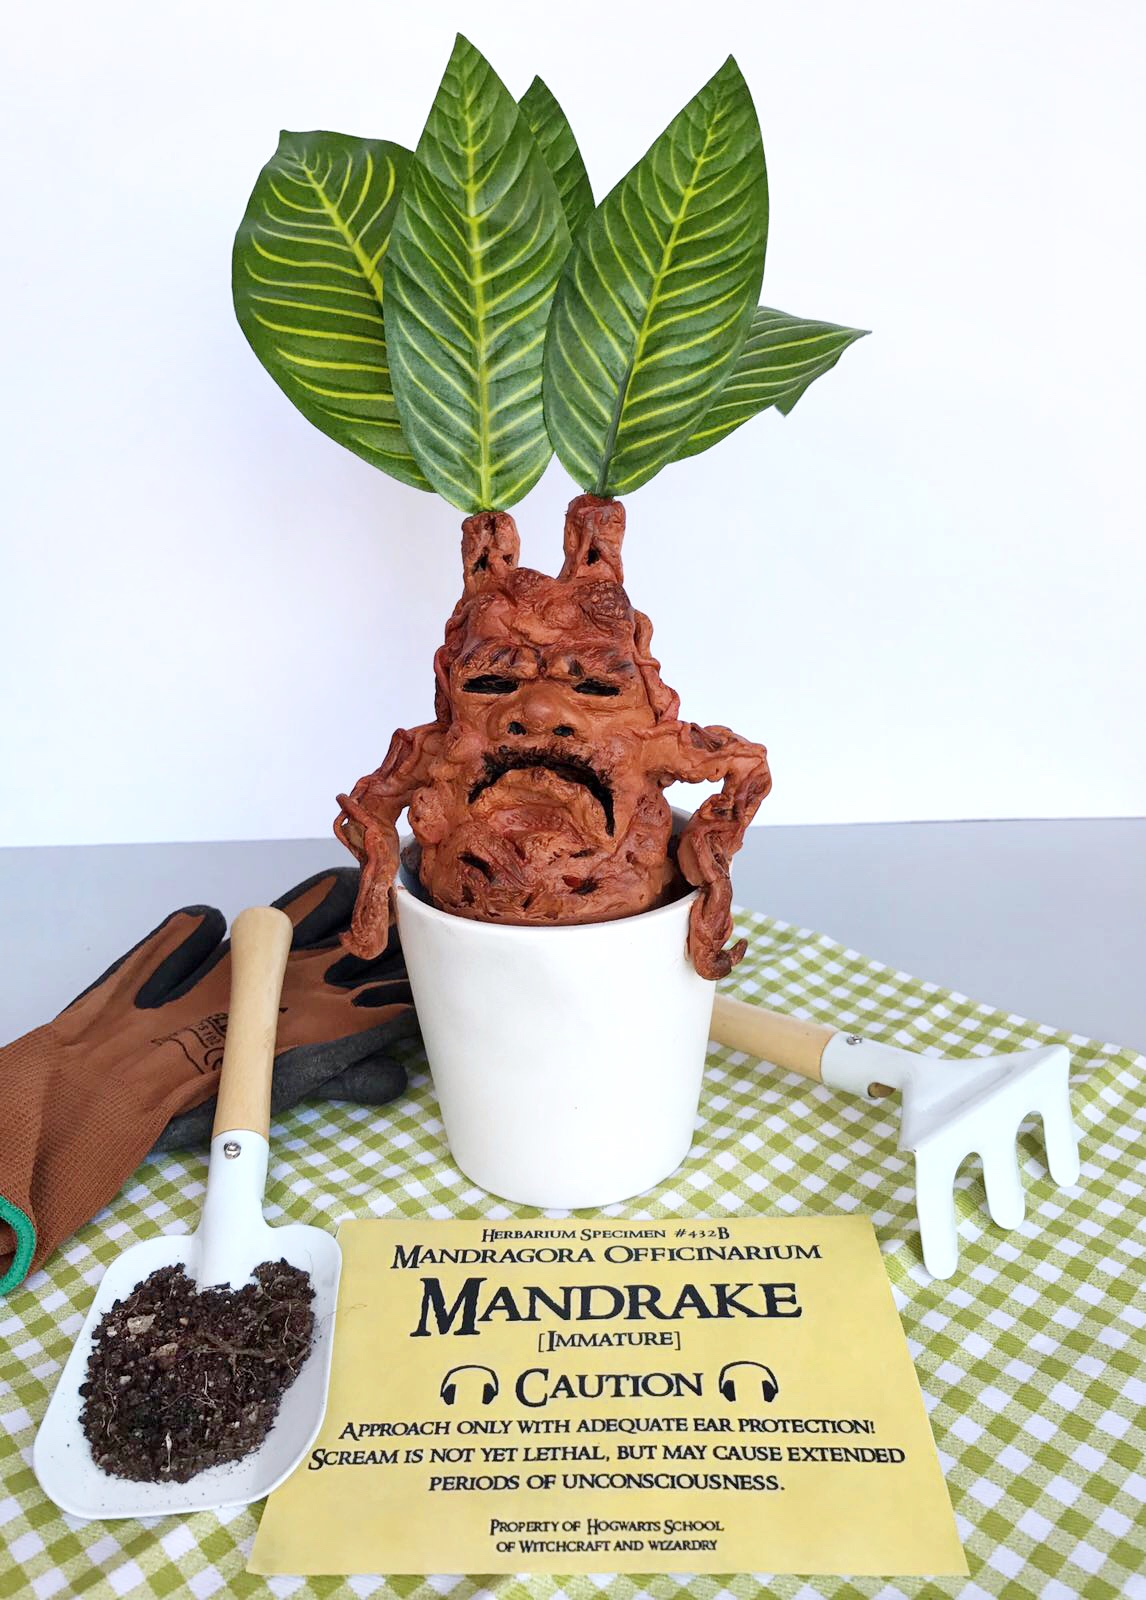 Fiesta diy de harry potter c mo hacer una mandr gora - Mandragora decoracion ...